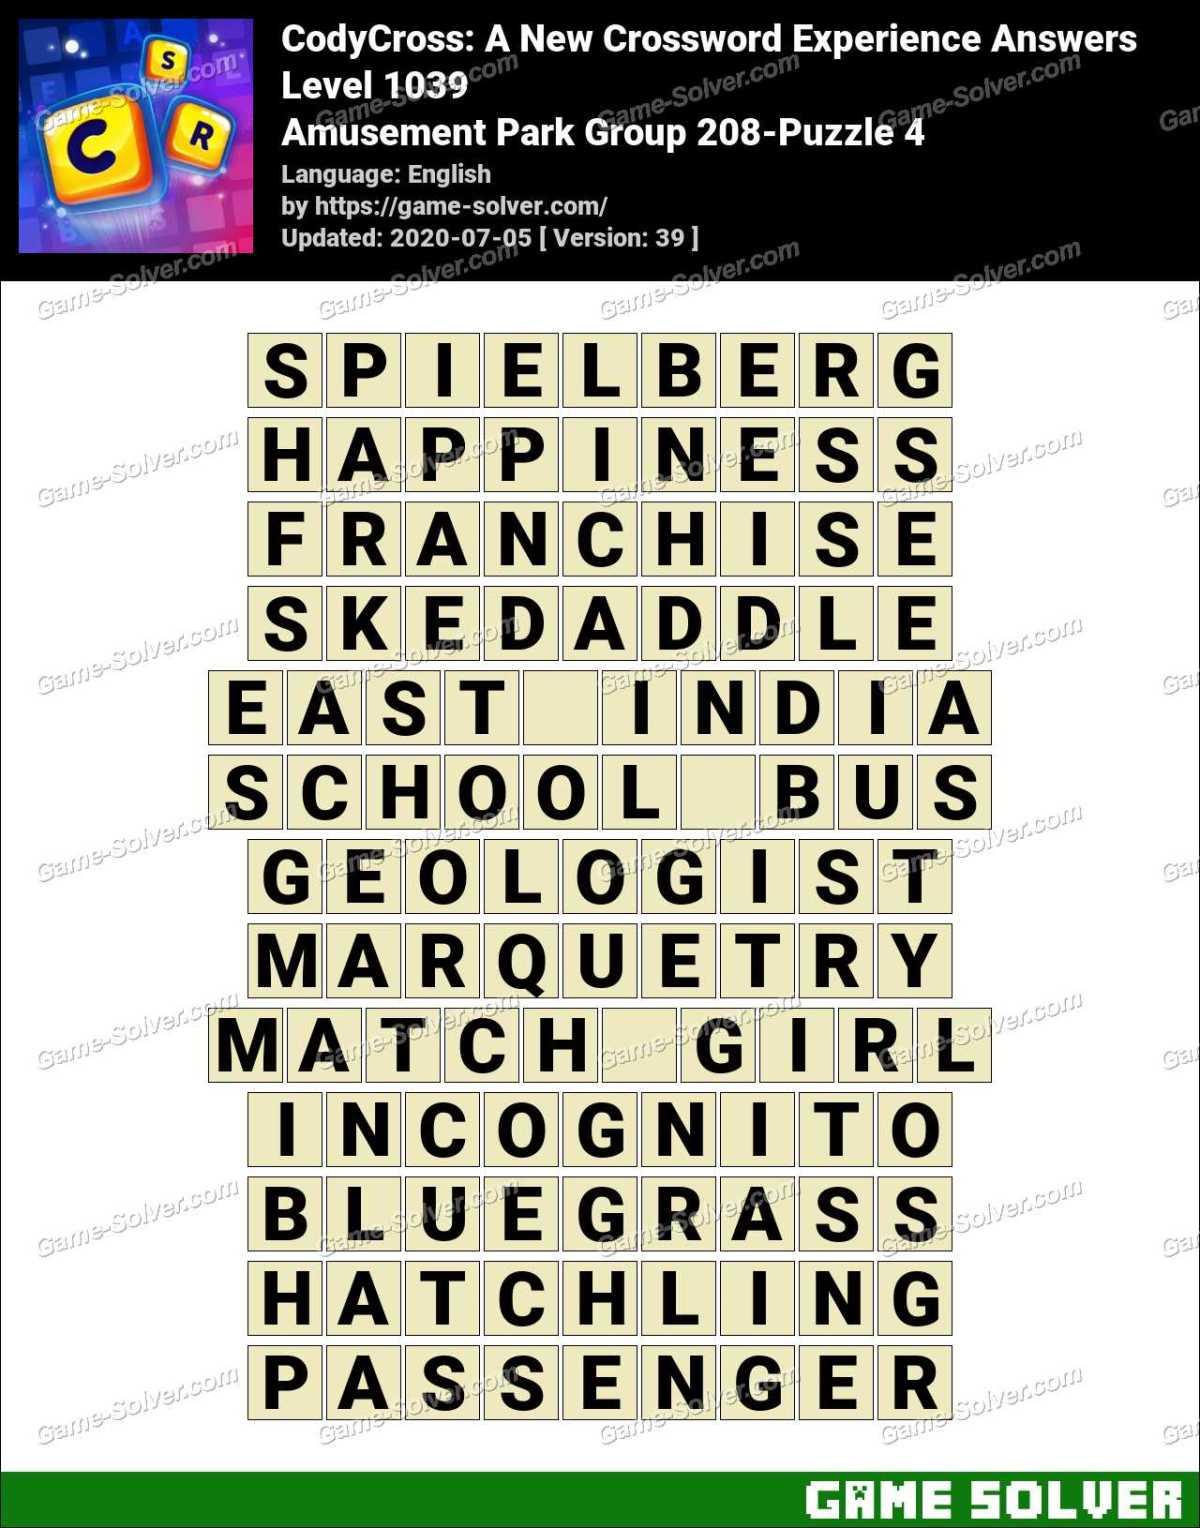 CodyCross Amusement Park Group 208-Puzzle 4 Answers